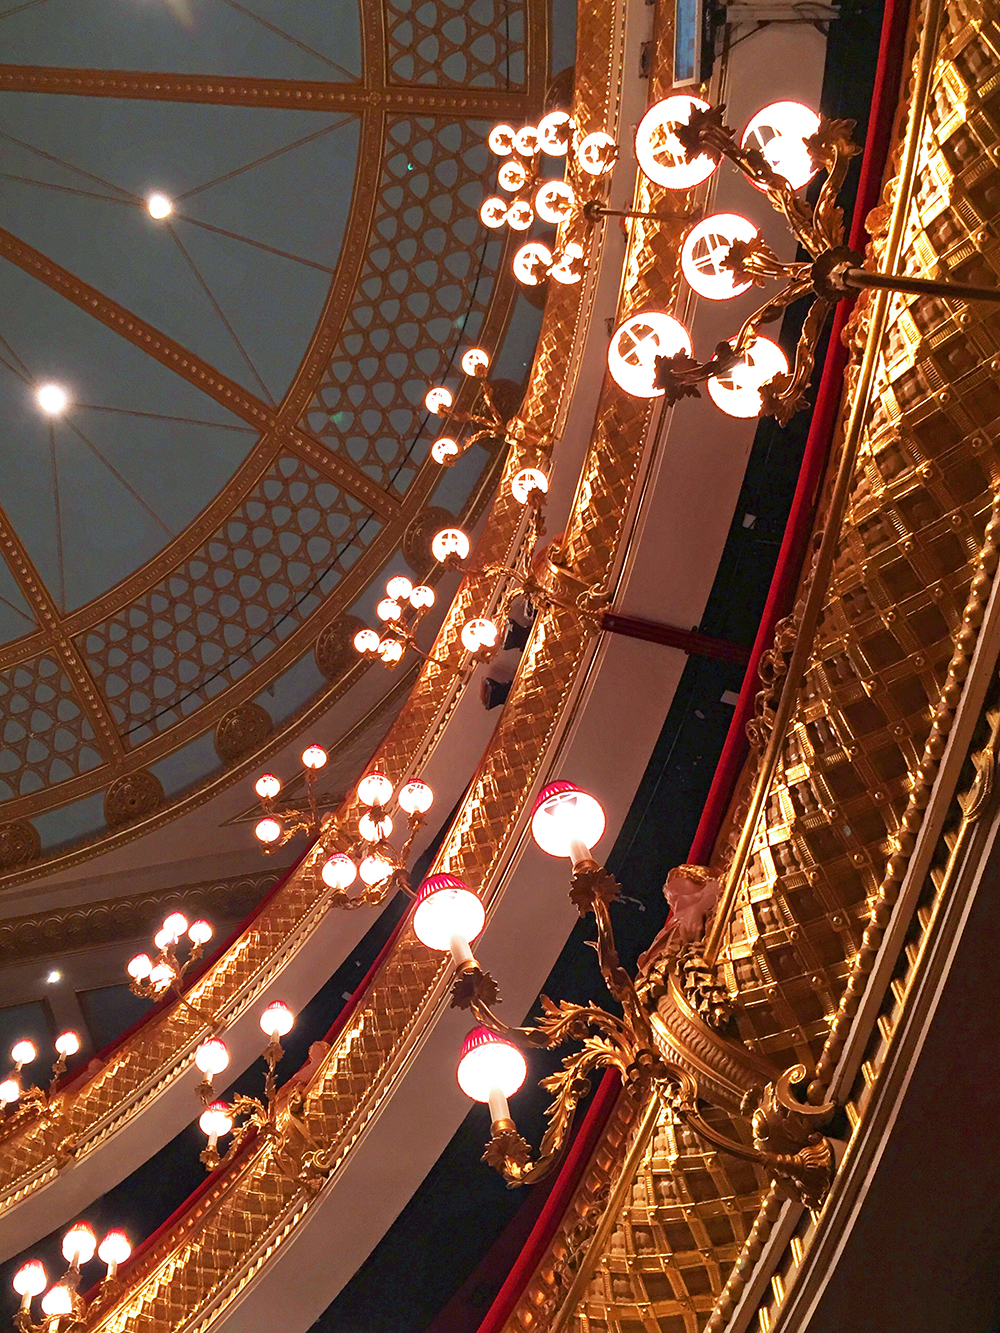 Turandot, Royal Opera House - London lifestyle & culture blog